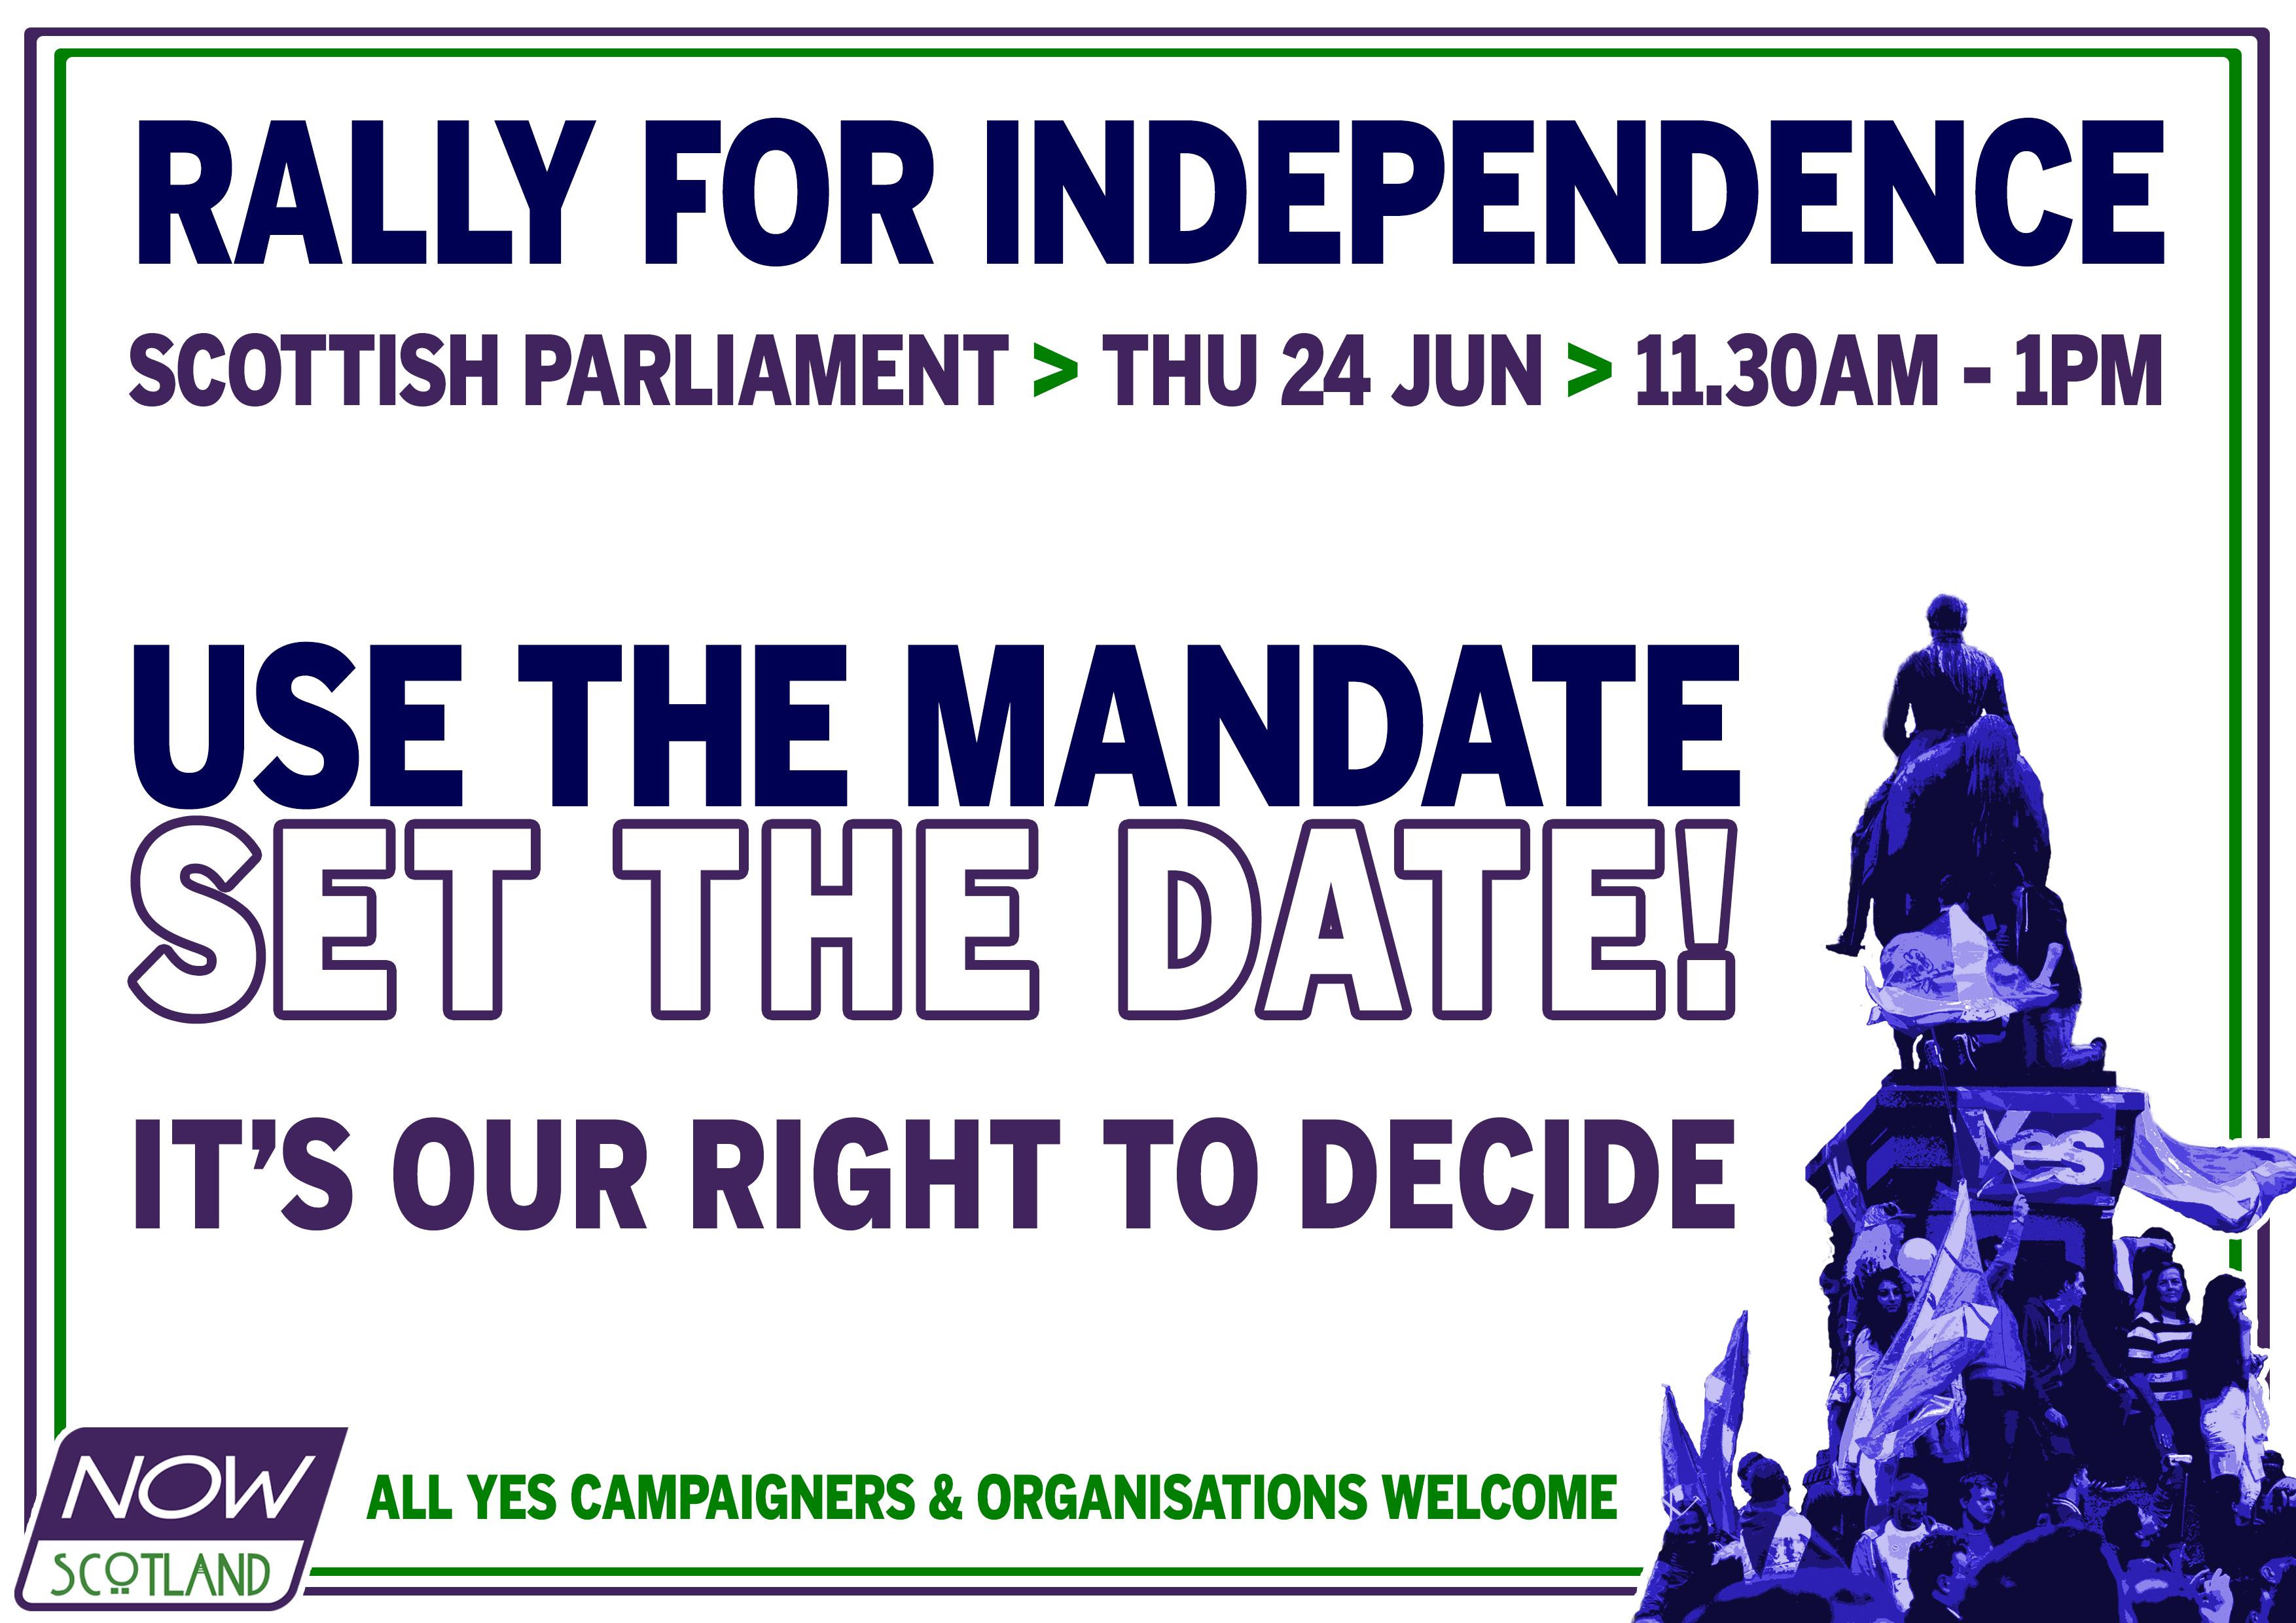 Now Scotland rally at Holyrood